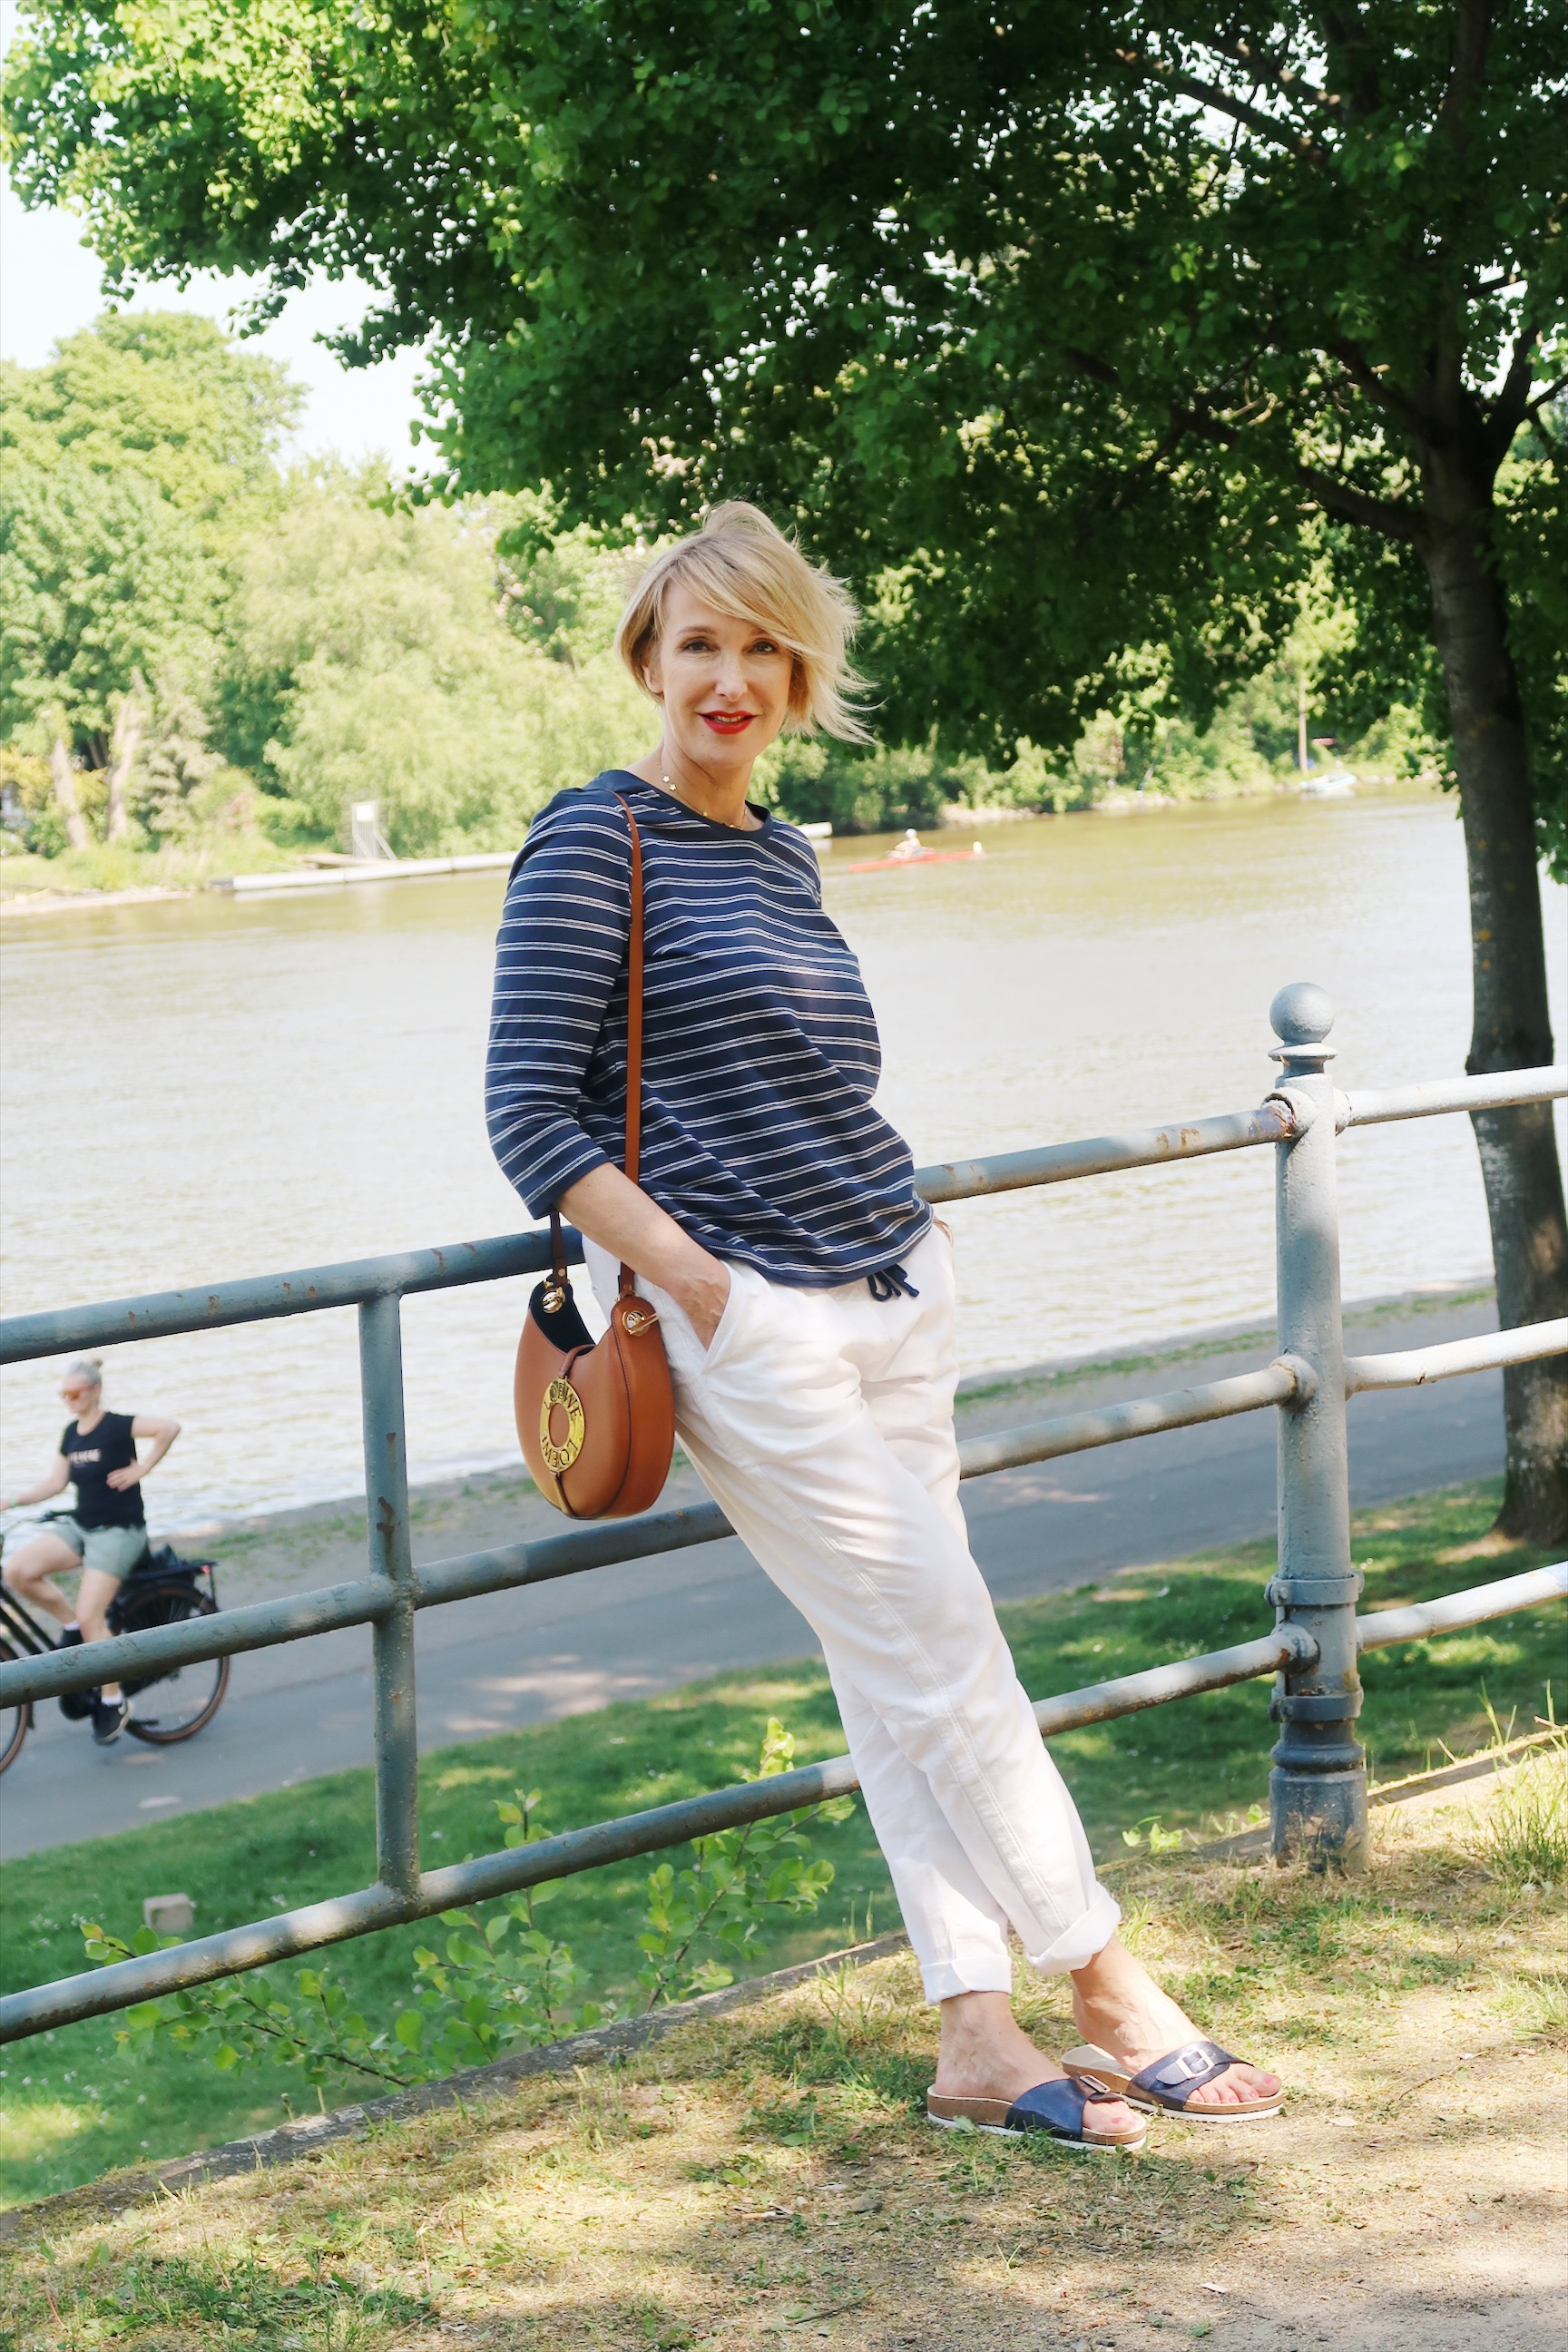 glamupyourlifestyle streifenshirt ringelpulli offshoulder-blouse leinenhose ue-40-mode ue-50-blog